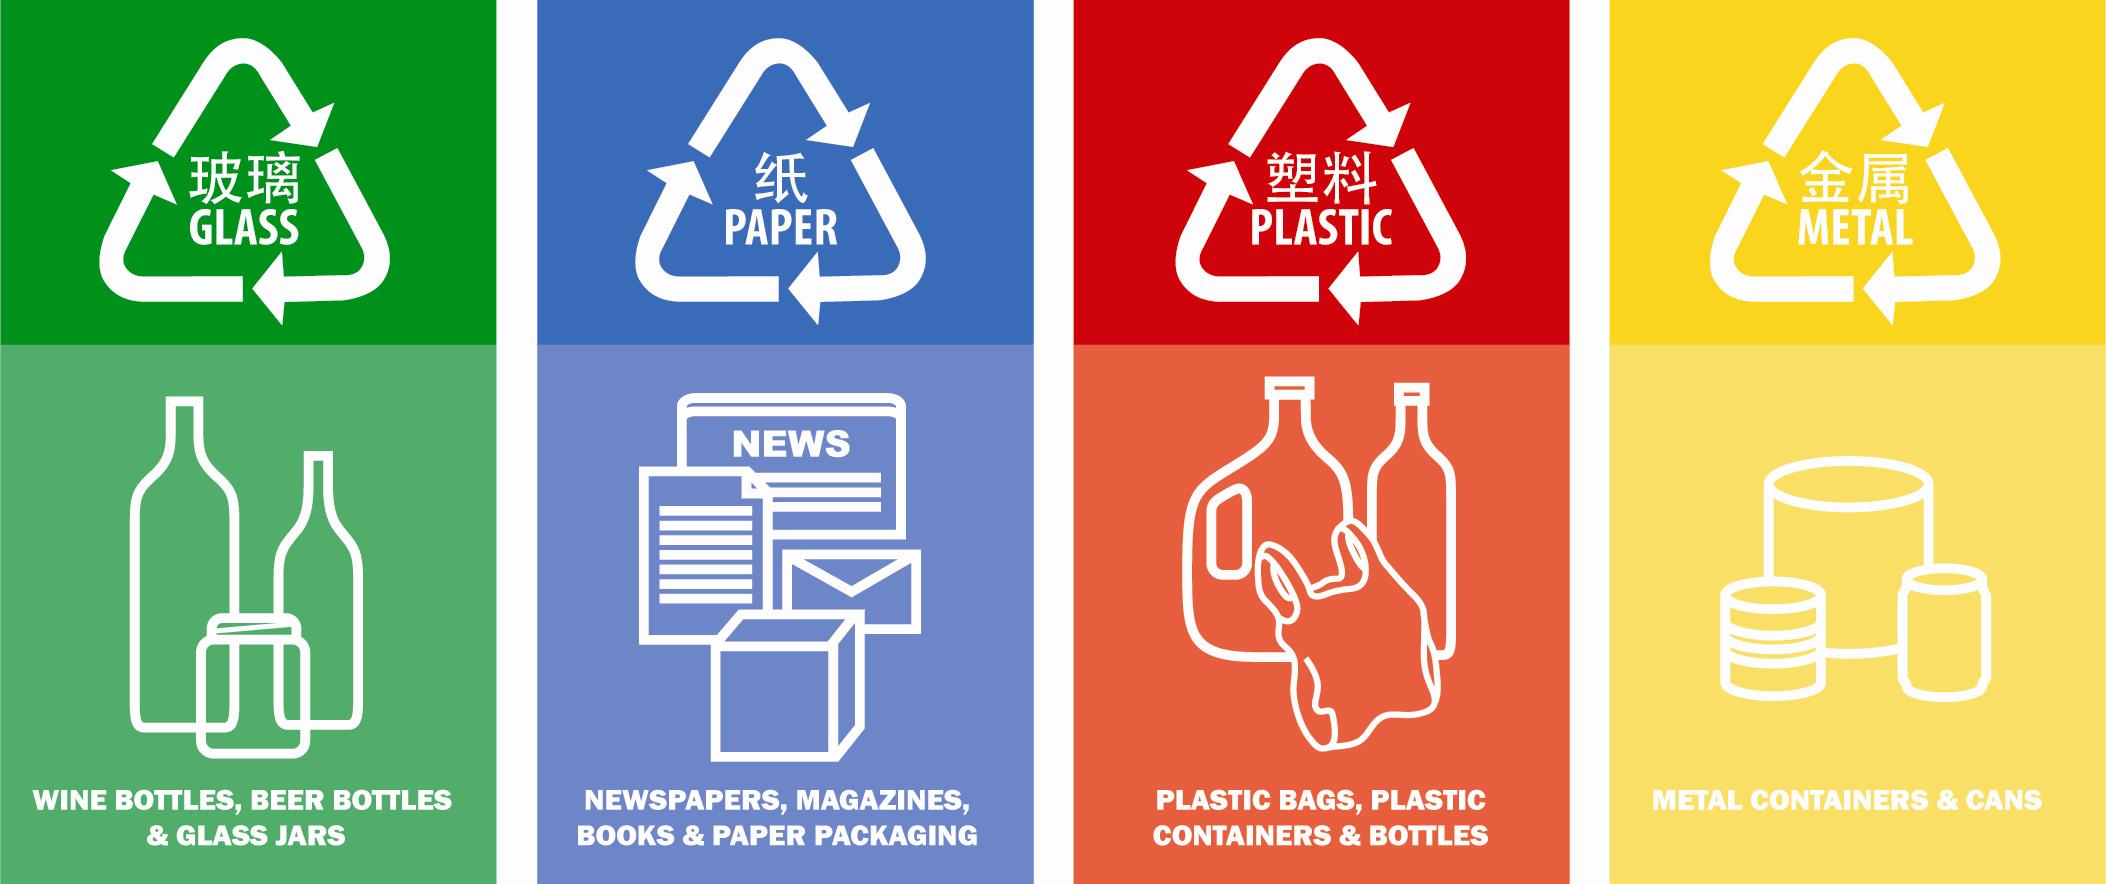 Free Recycling Bins Download Free Clip Art Free Clip Art